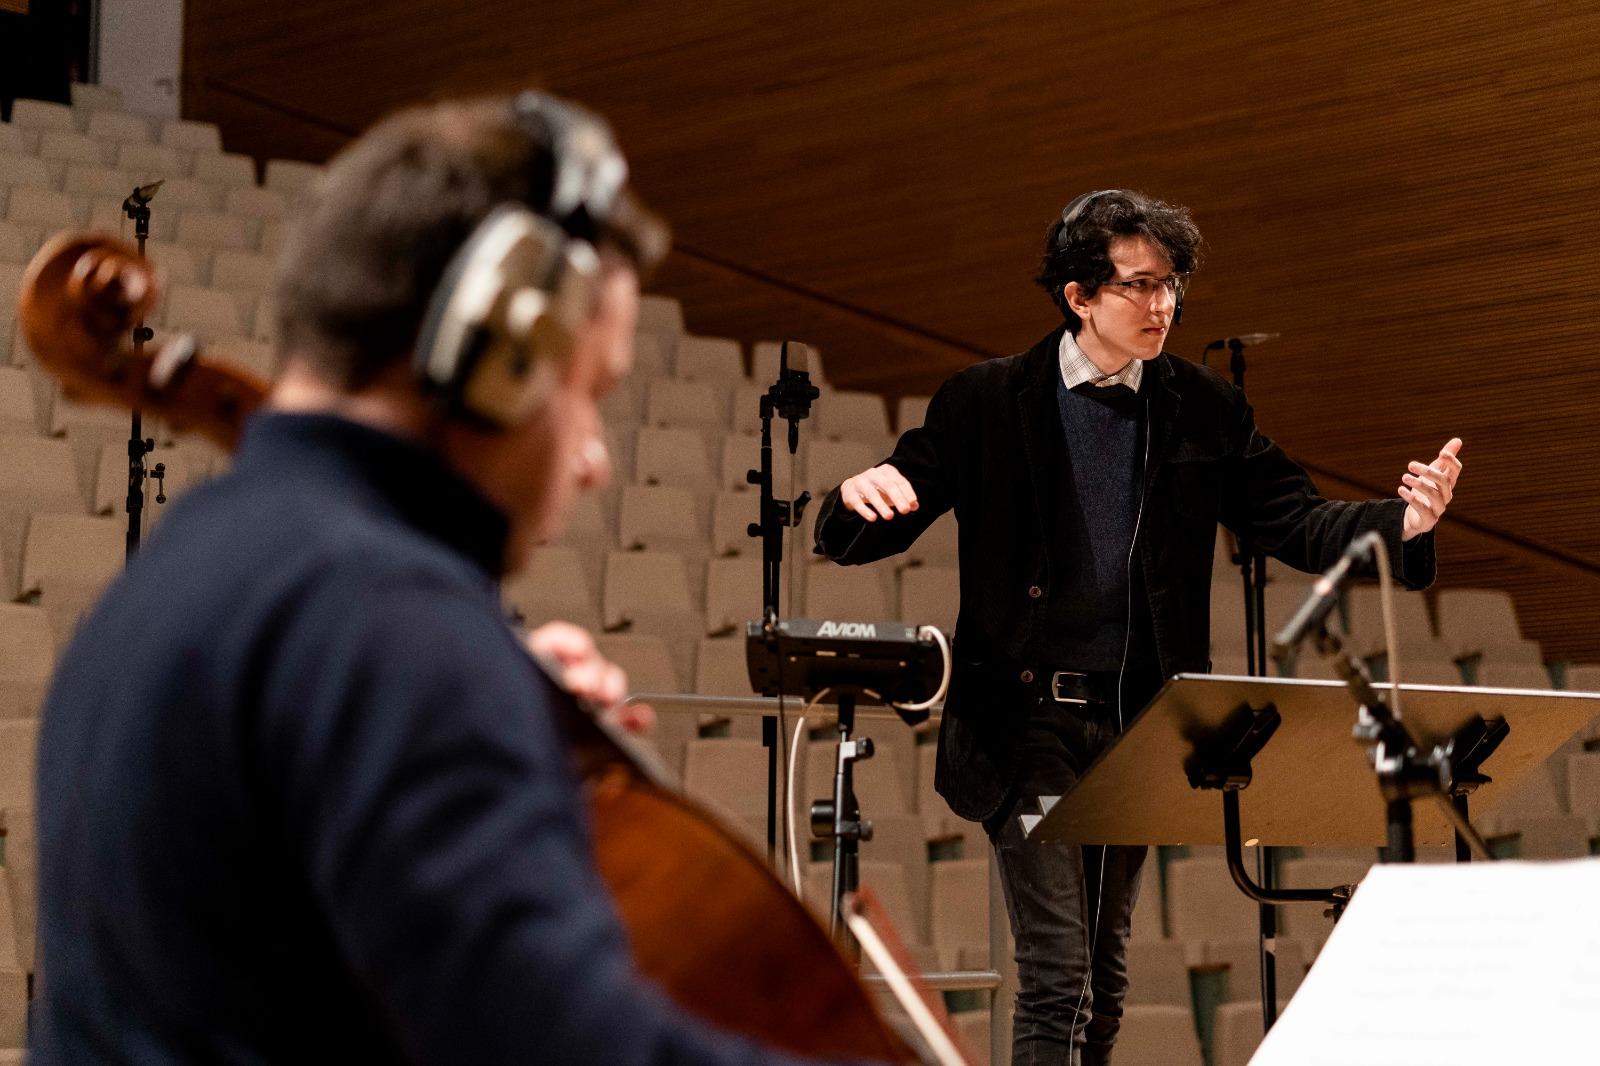 Hillel Teplitzki - Professional Composer